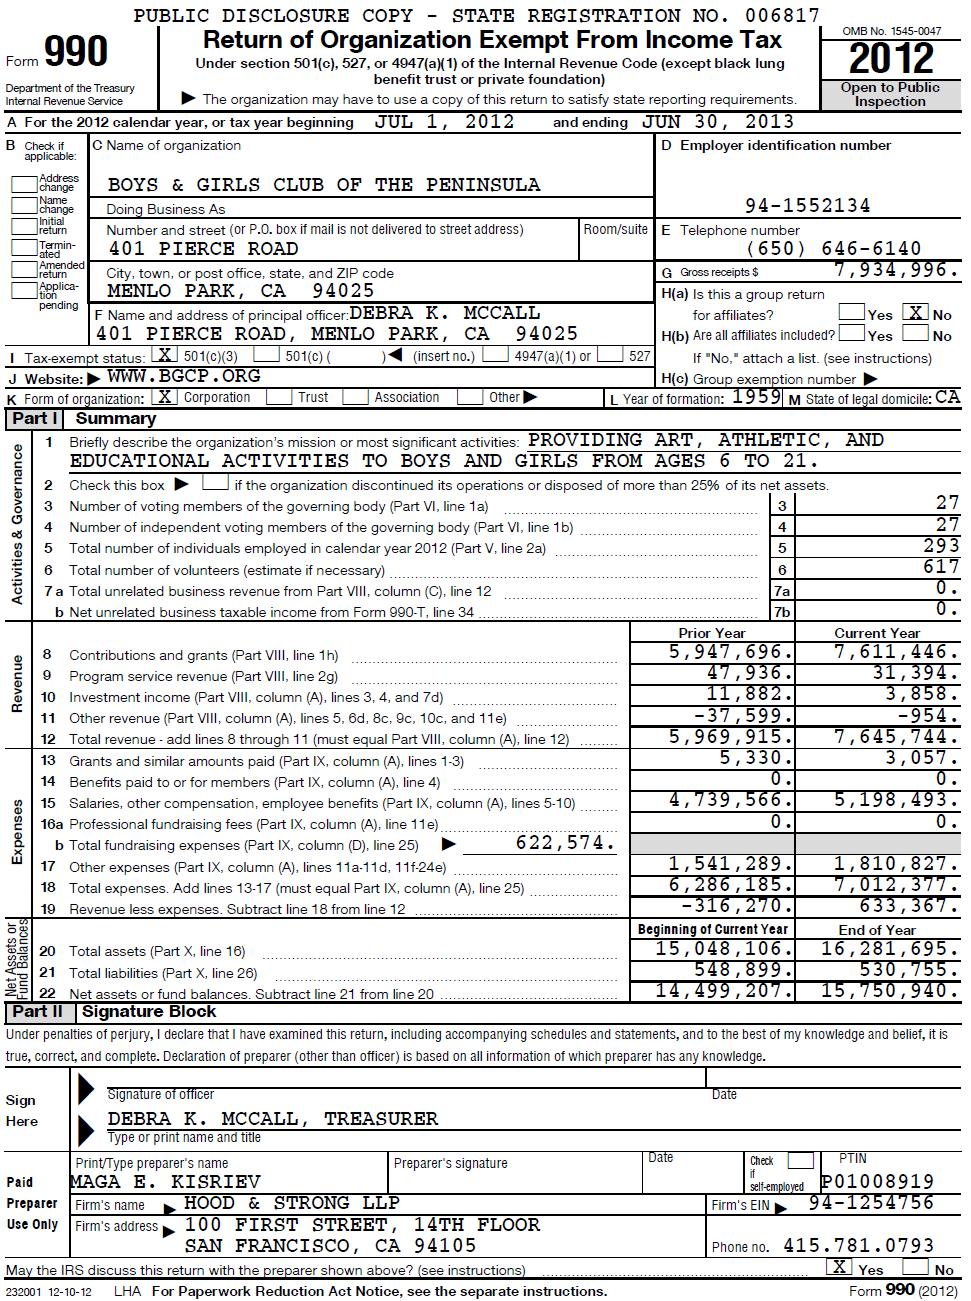 IRS Form 990 - 2013